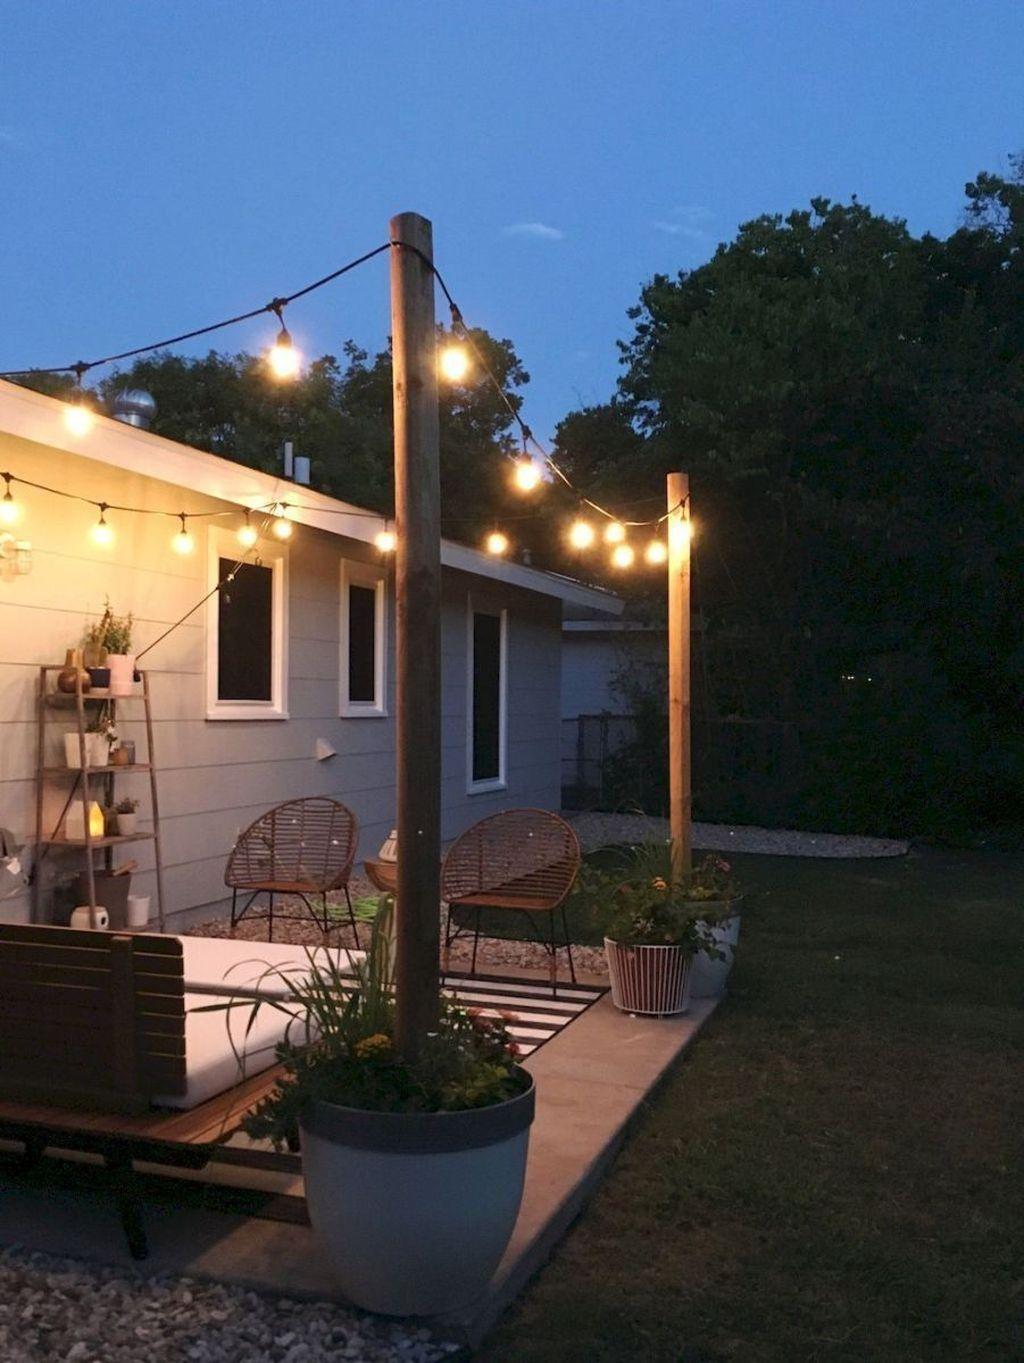 Popular Backyard Lighting Ideas Makes It Look Beautiful Patio Makeover Backyard Patio Patio Seating Area